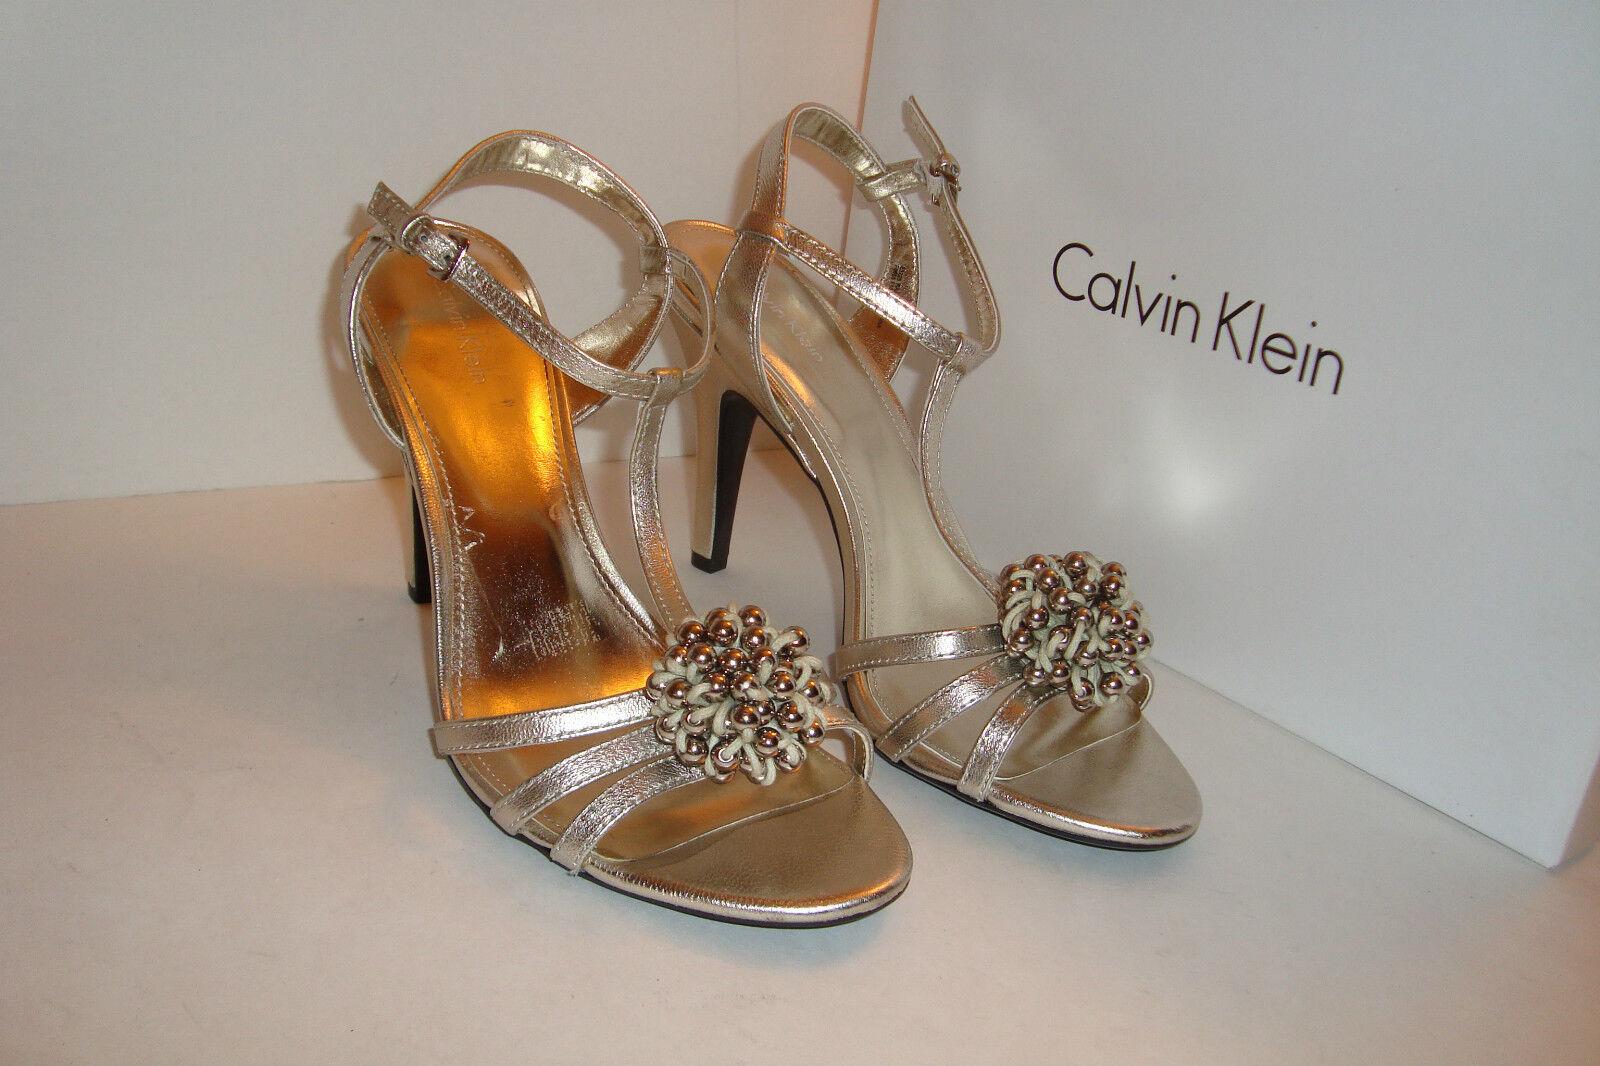 Calvin Klein Damenschuhe Rajah Metallic Off WEISS Sandales Schuhes 9 MED DISPLAY MODEL